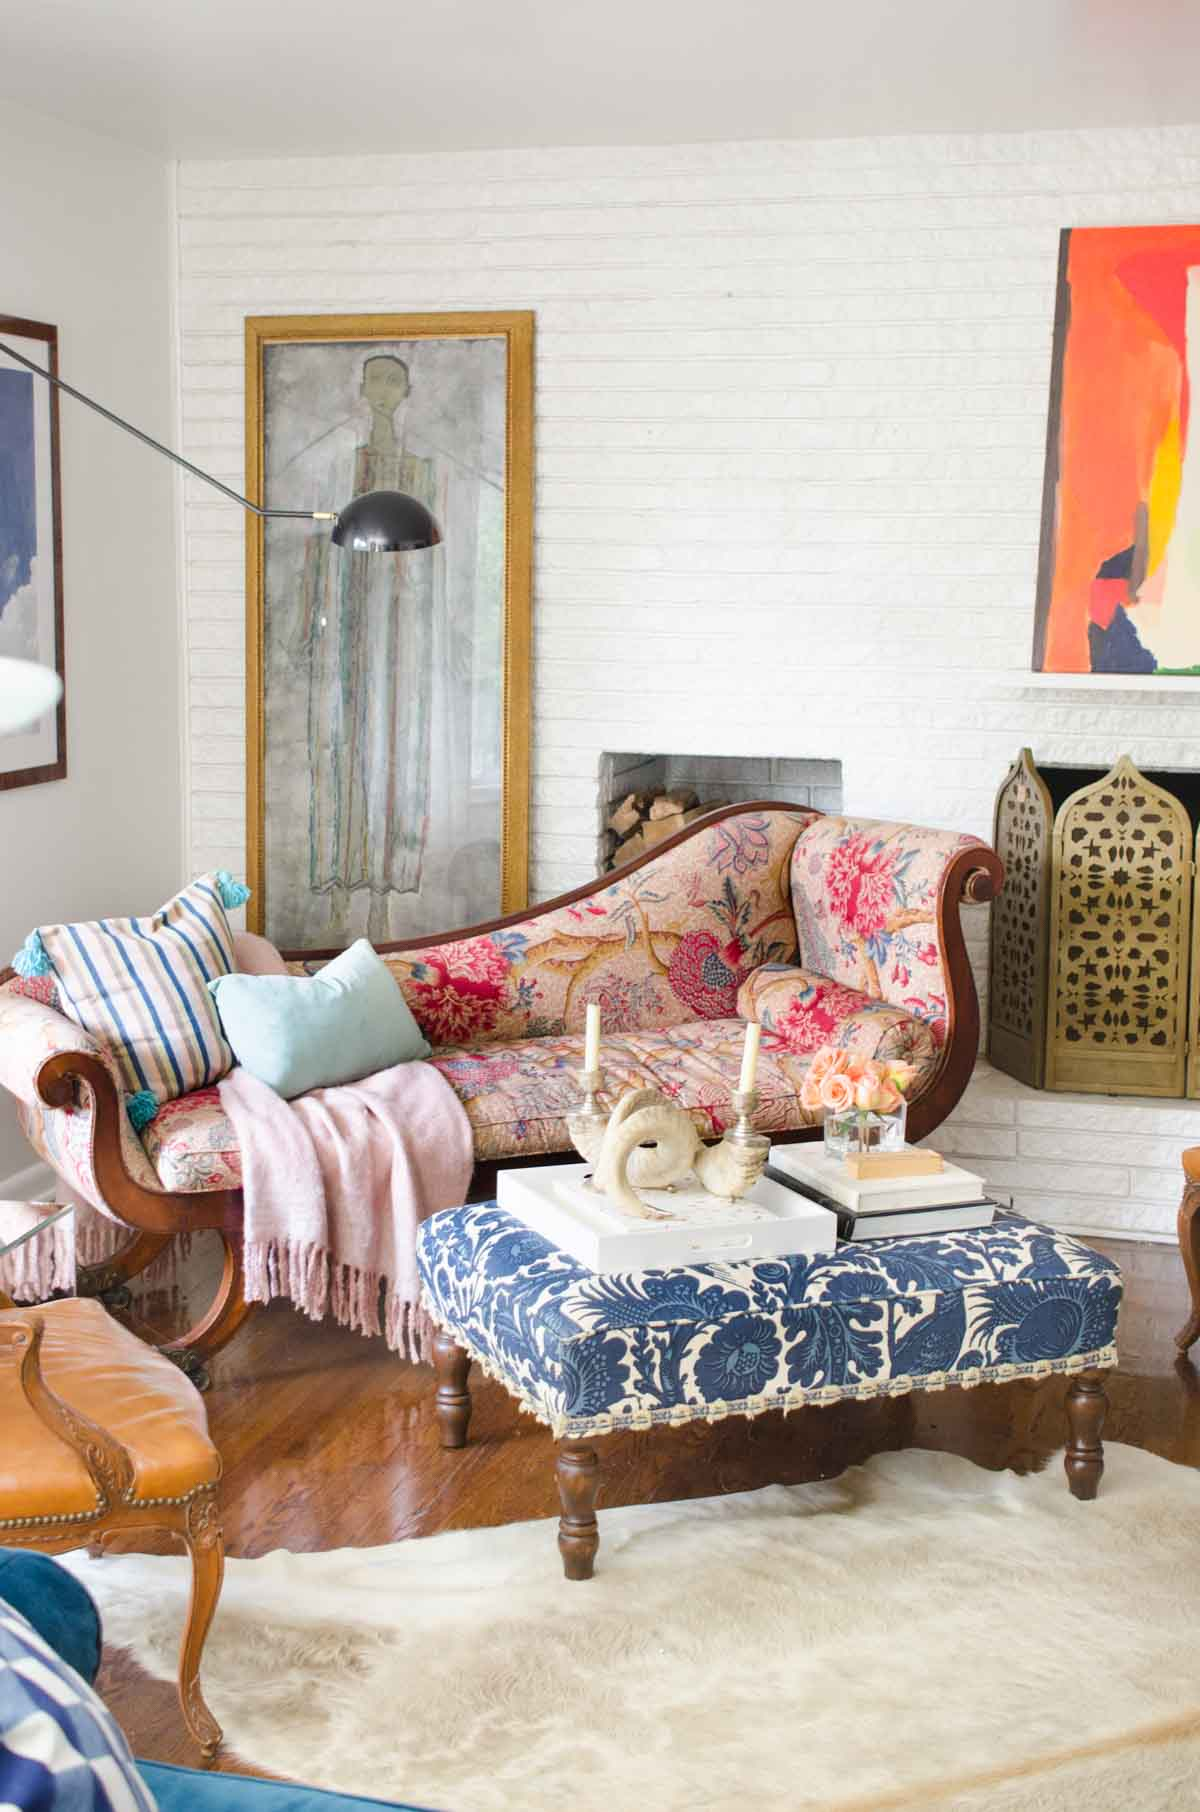 Living Room Decor Ideas: One Room Challenge: Living Room Reveal